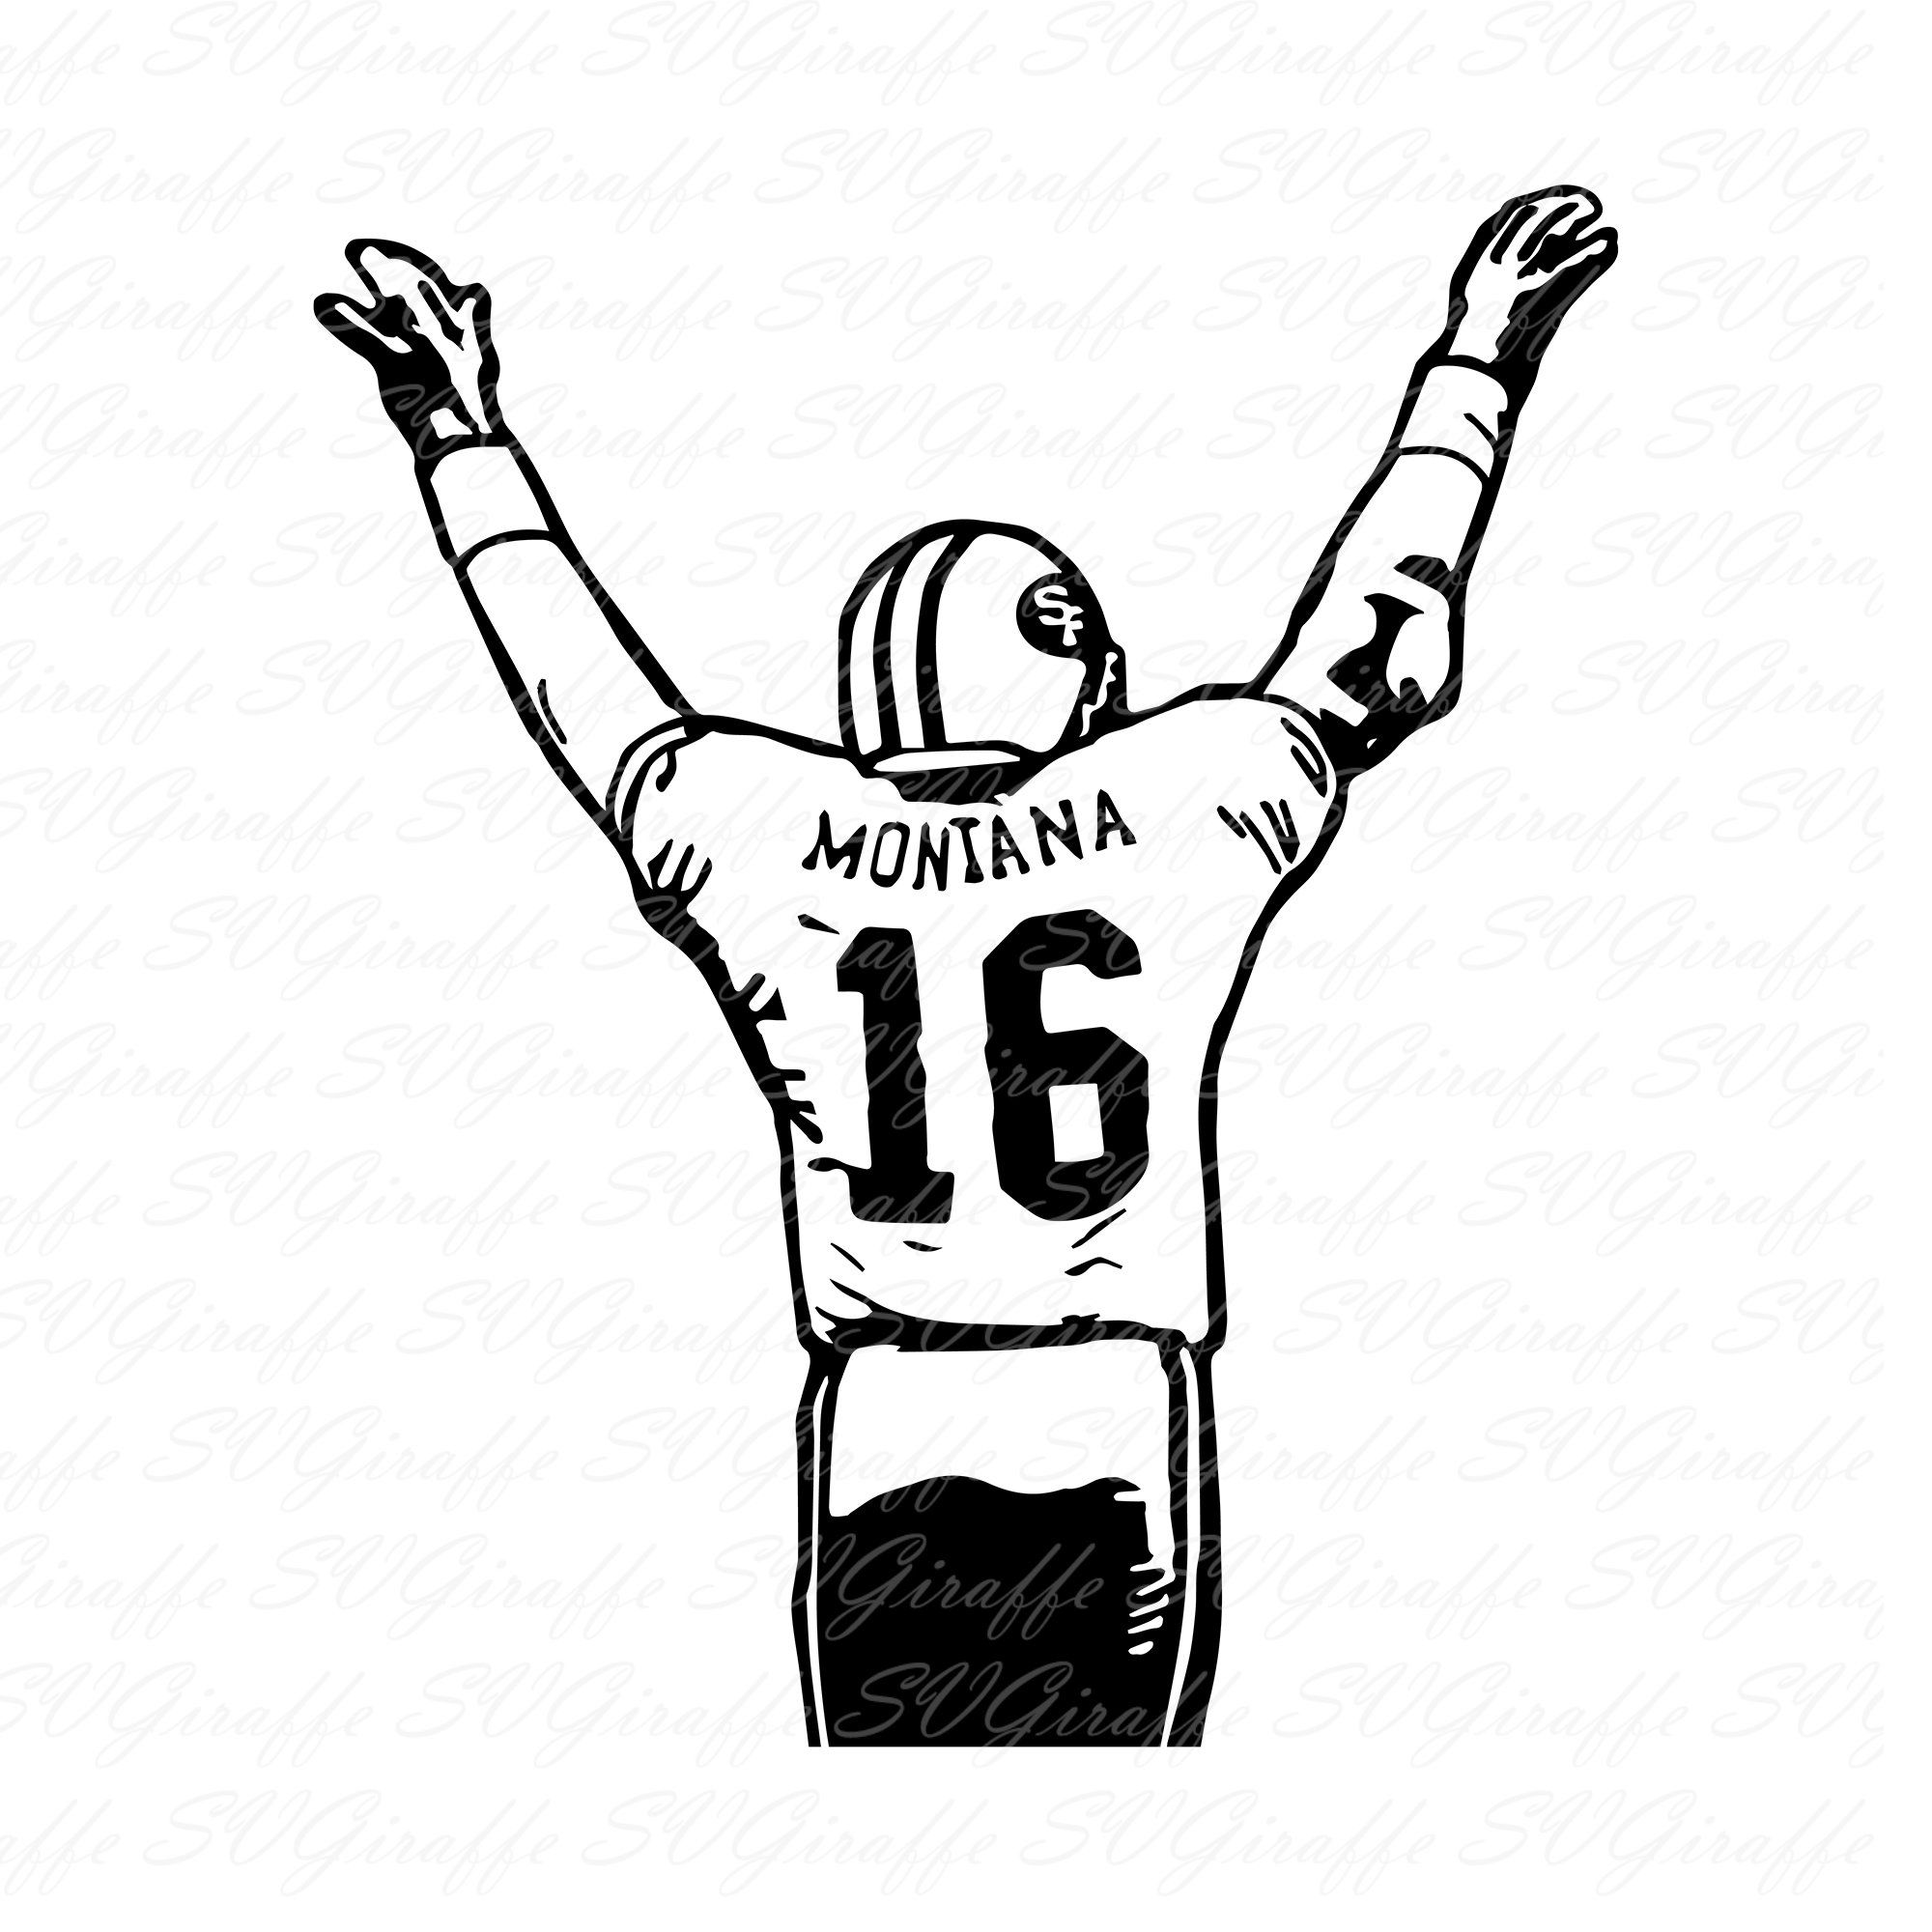 Joe Montana Svg Dxf Png Pdf Jpg Eps Files San Fancisco 49ers Etsy Joe Montana Vector Svg Svg